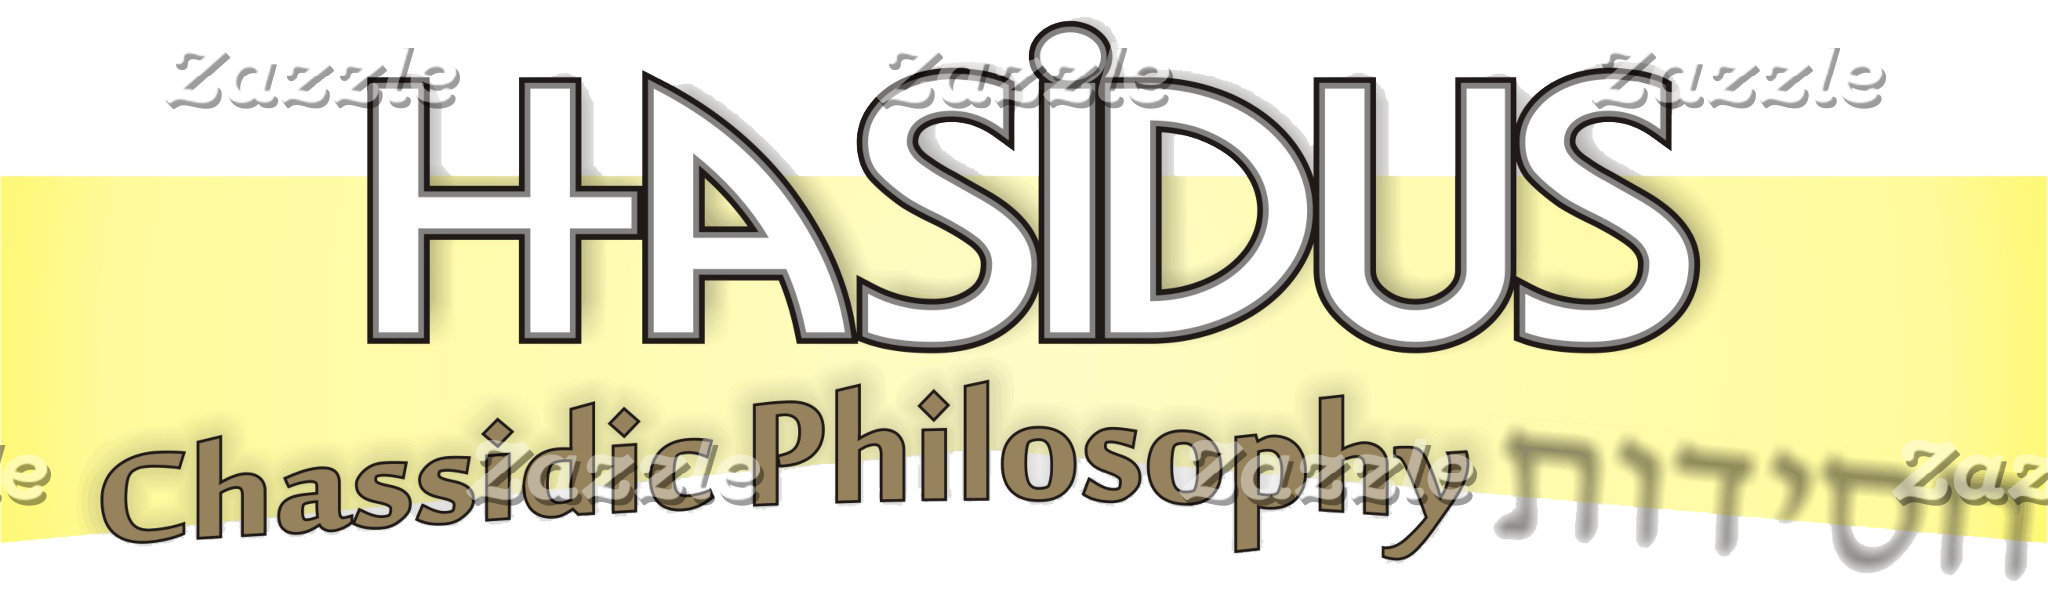 Hasidus-Chassidic Philosophy